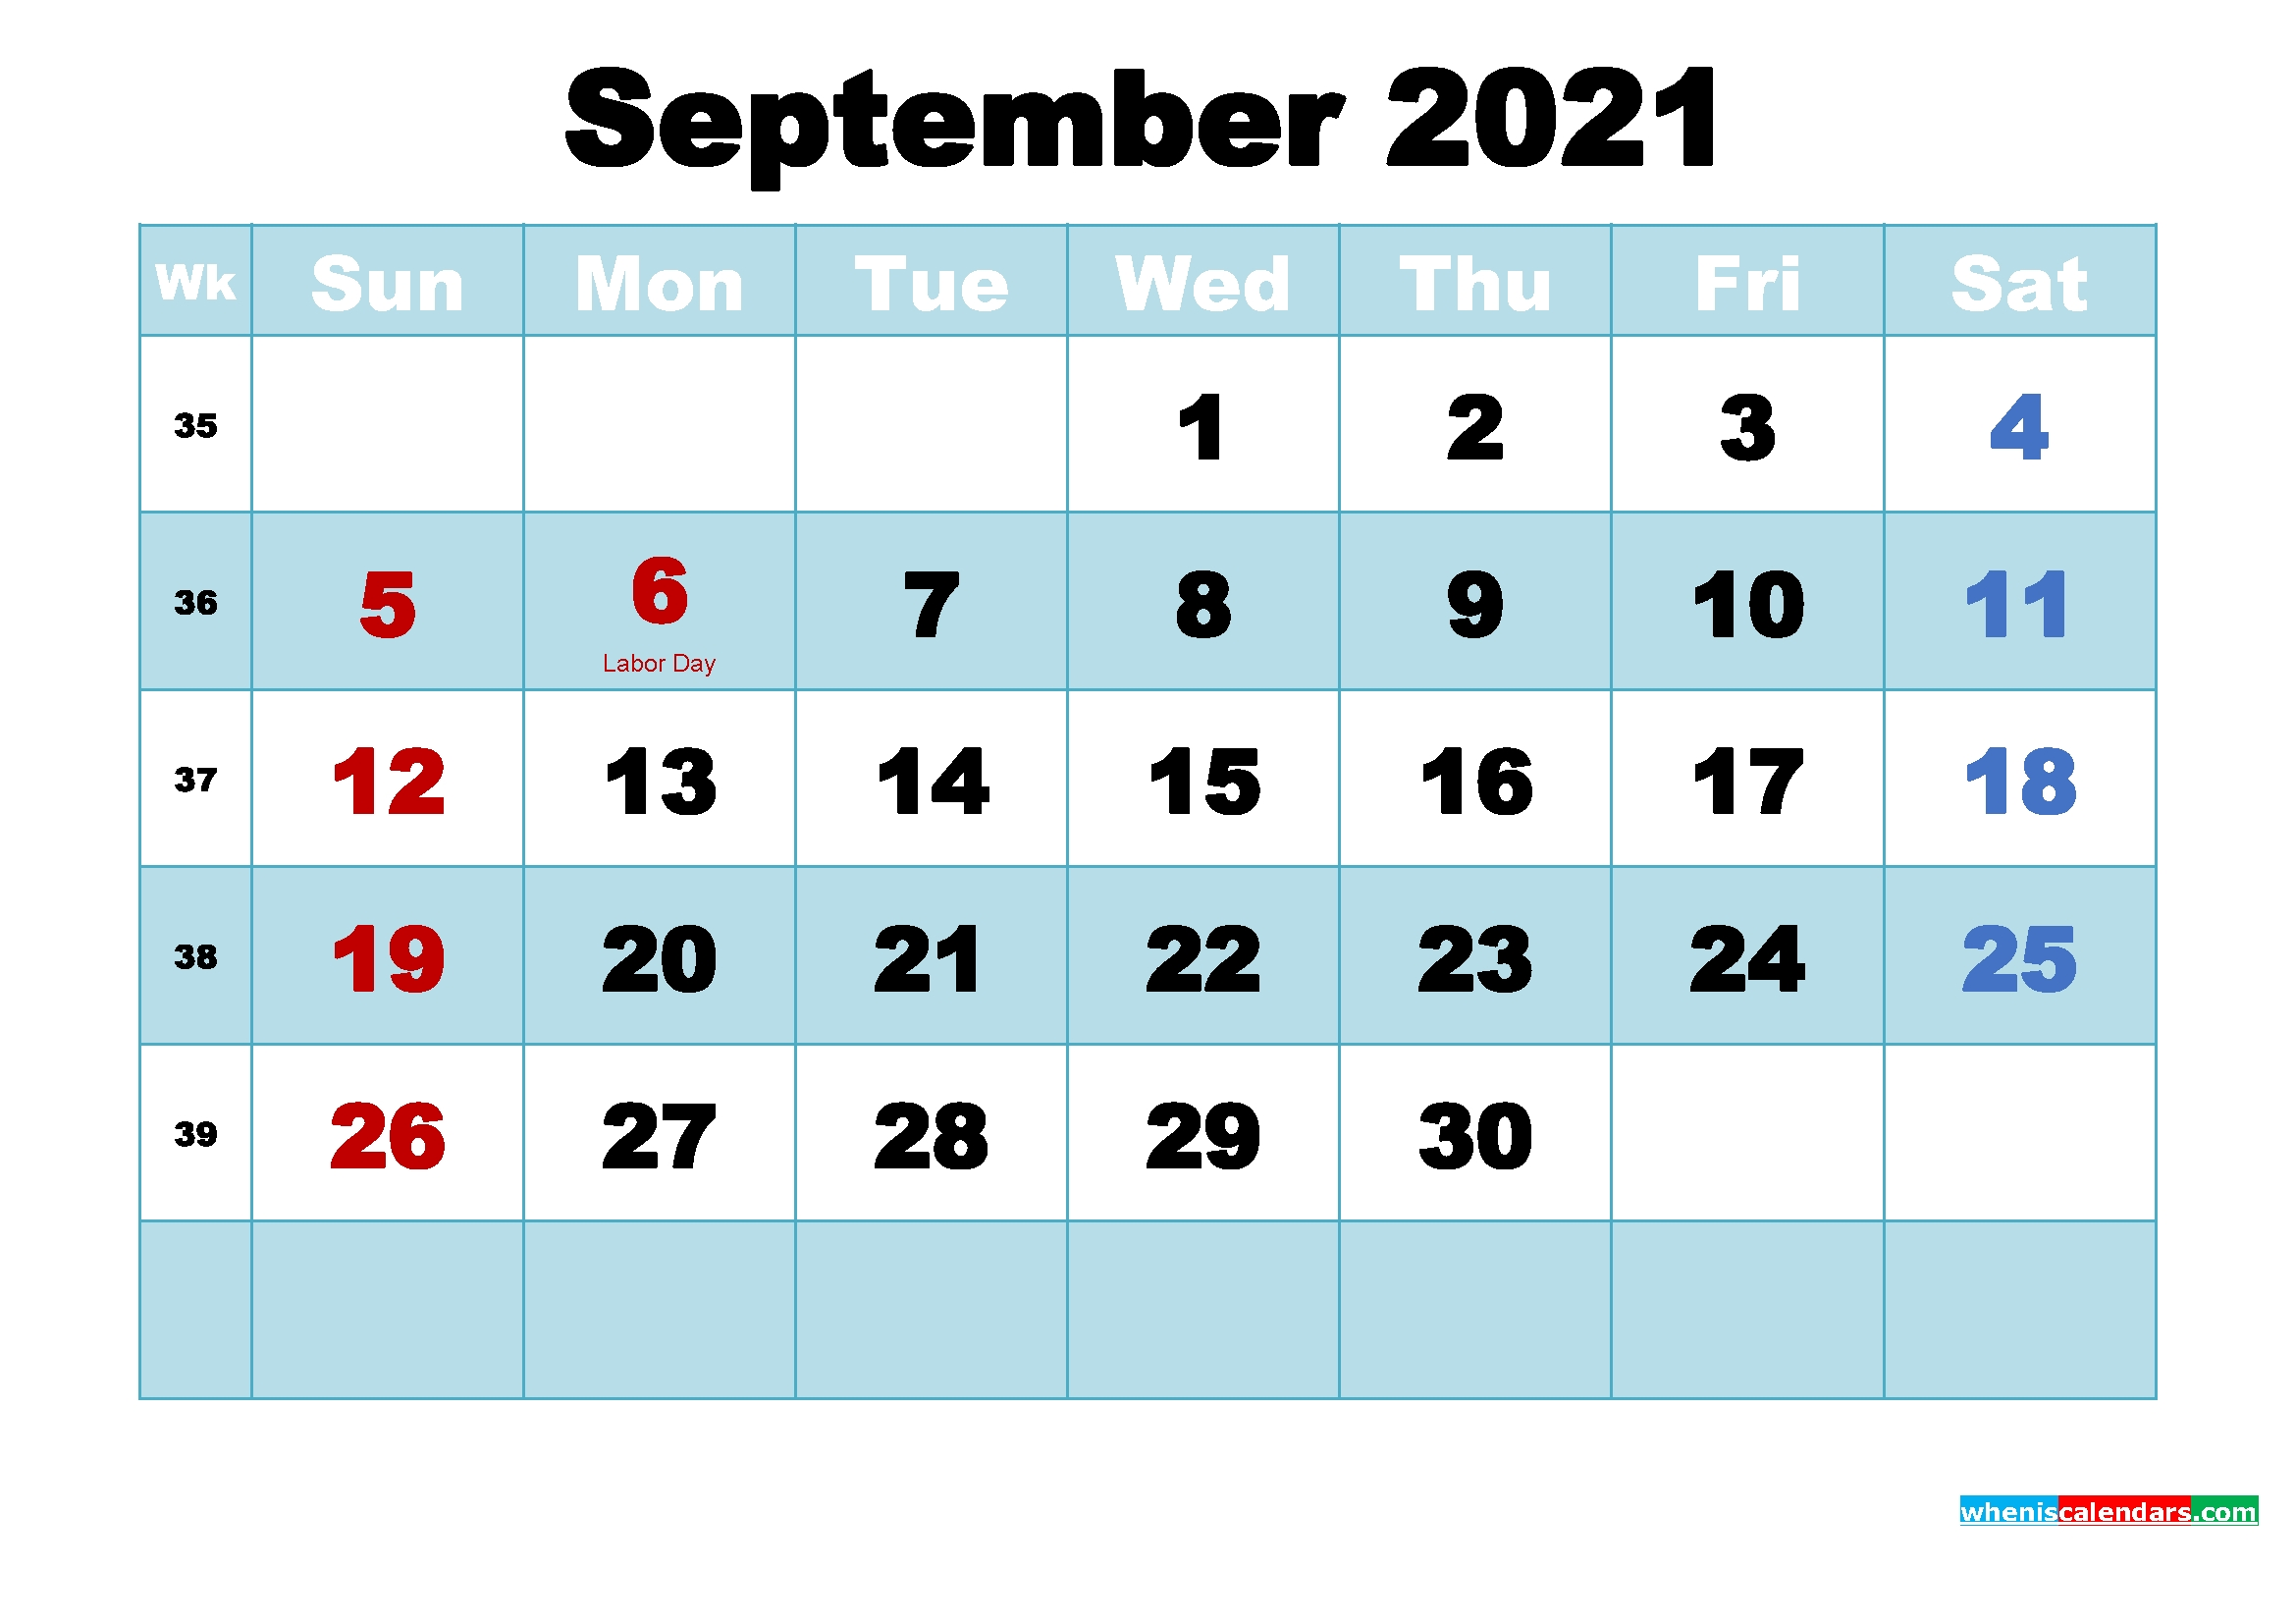 September 2021 Free Printable Calendar With Holidays September 2021 Calendar Image